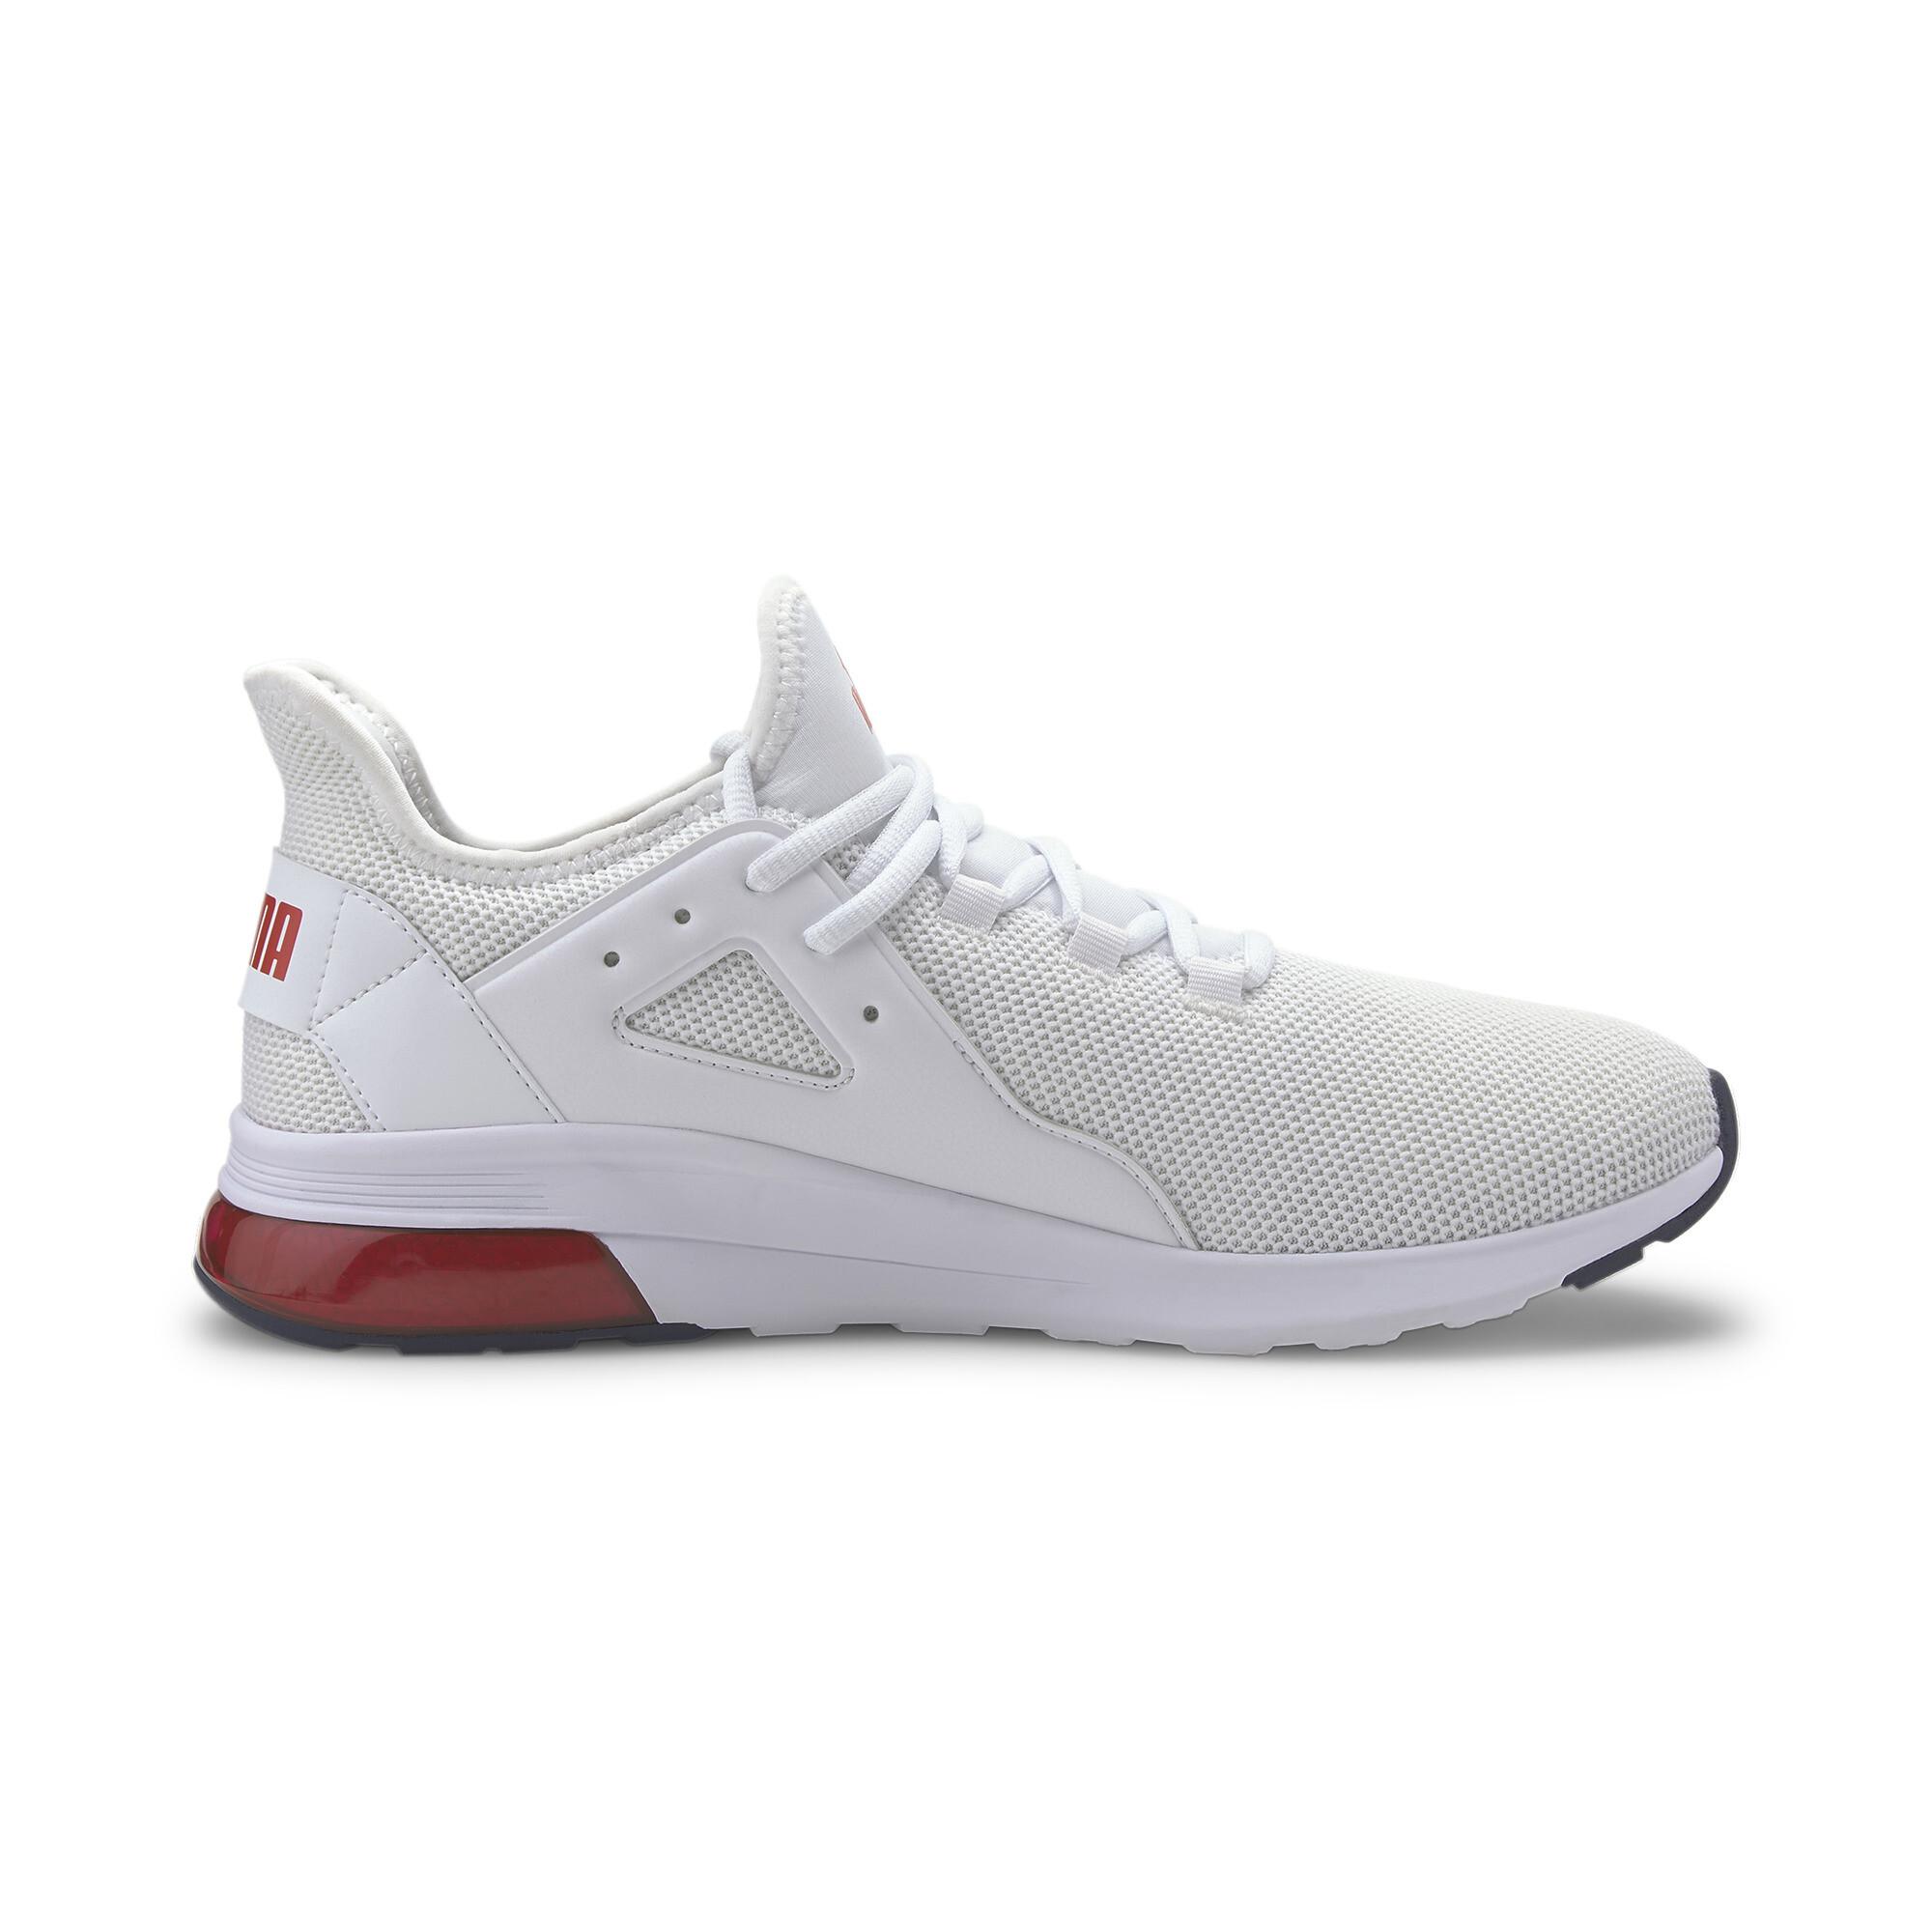 PUMA-Electron-Street-Men-039-s-Sneakers-Men-Shoe-Basics thumbnail 19